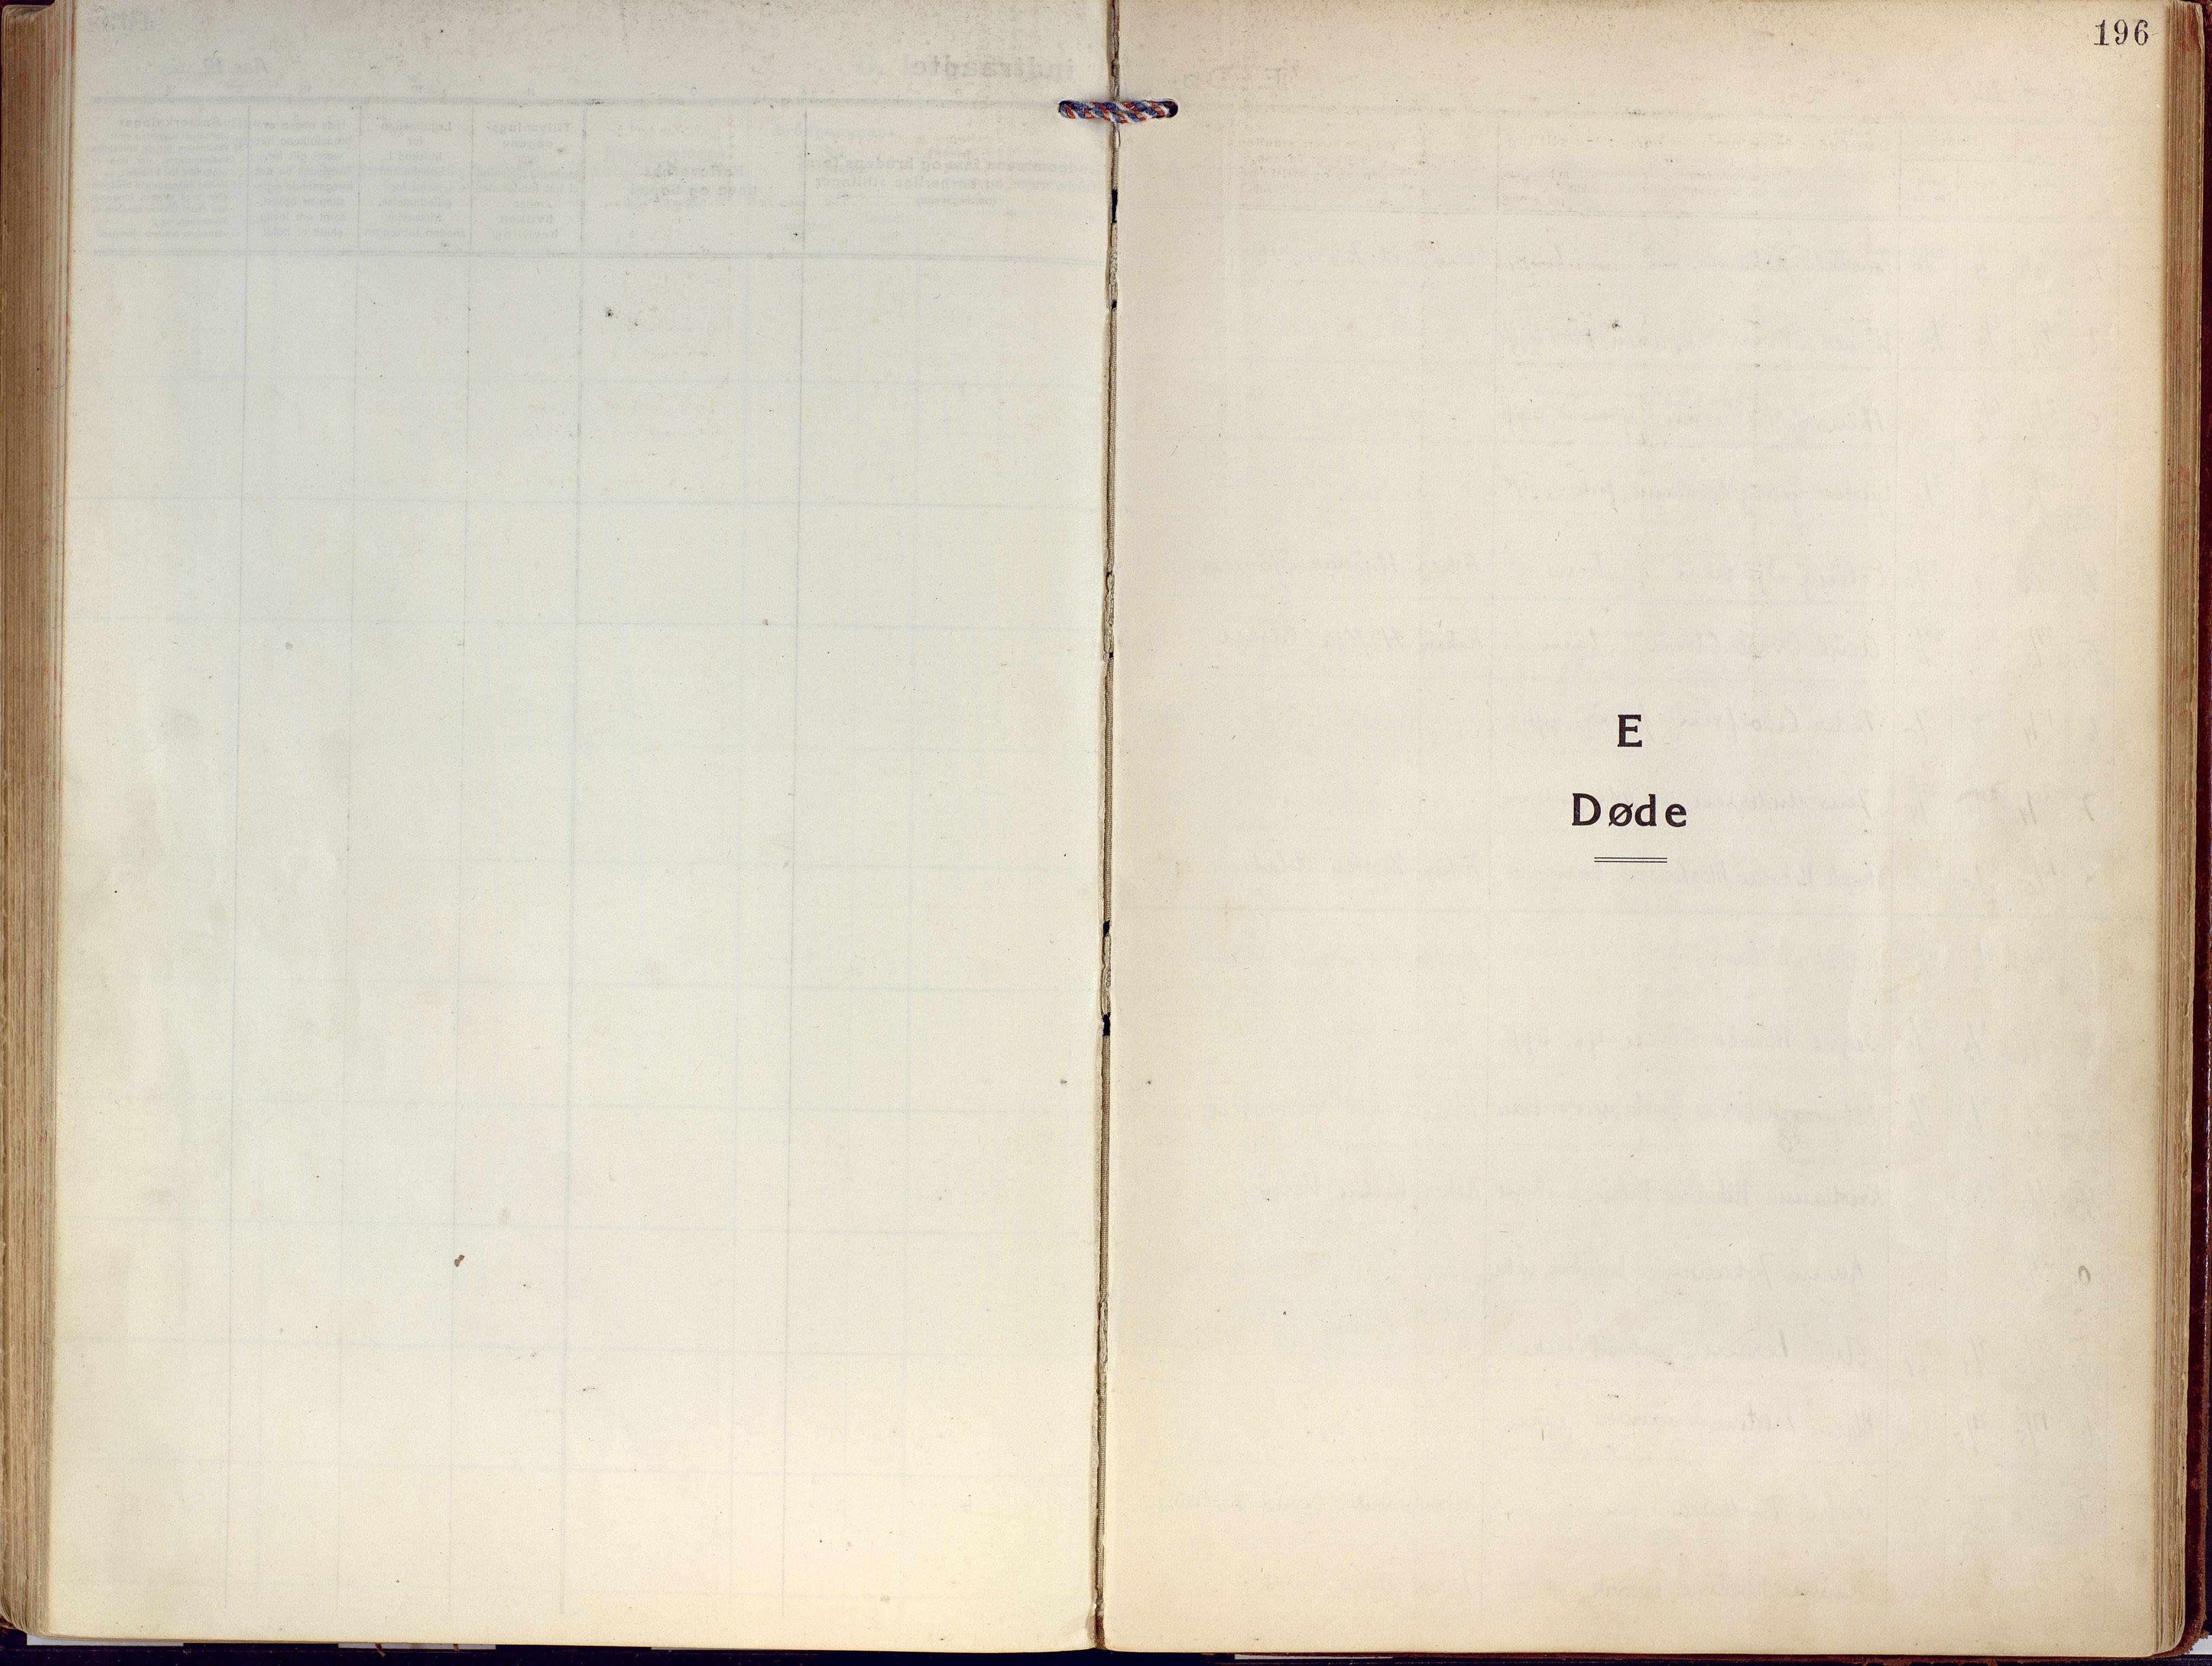 SATØ, Kjelvik/Nordkapp sokneprestkontor, H/Ha/L0002kirke: Ministerialbok nr. 2, 1920-1929, s. 196